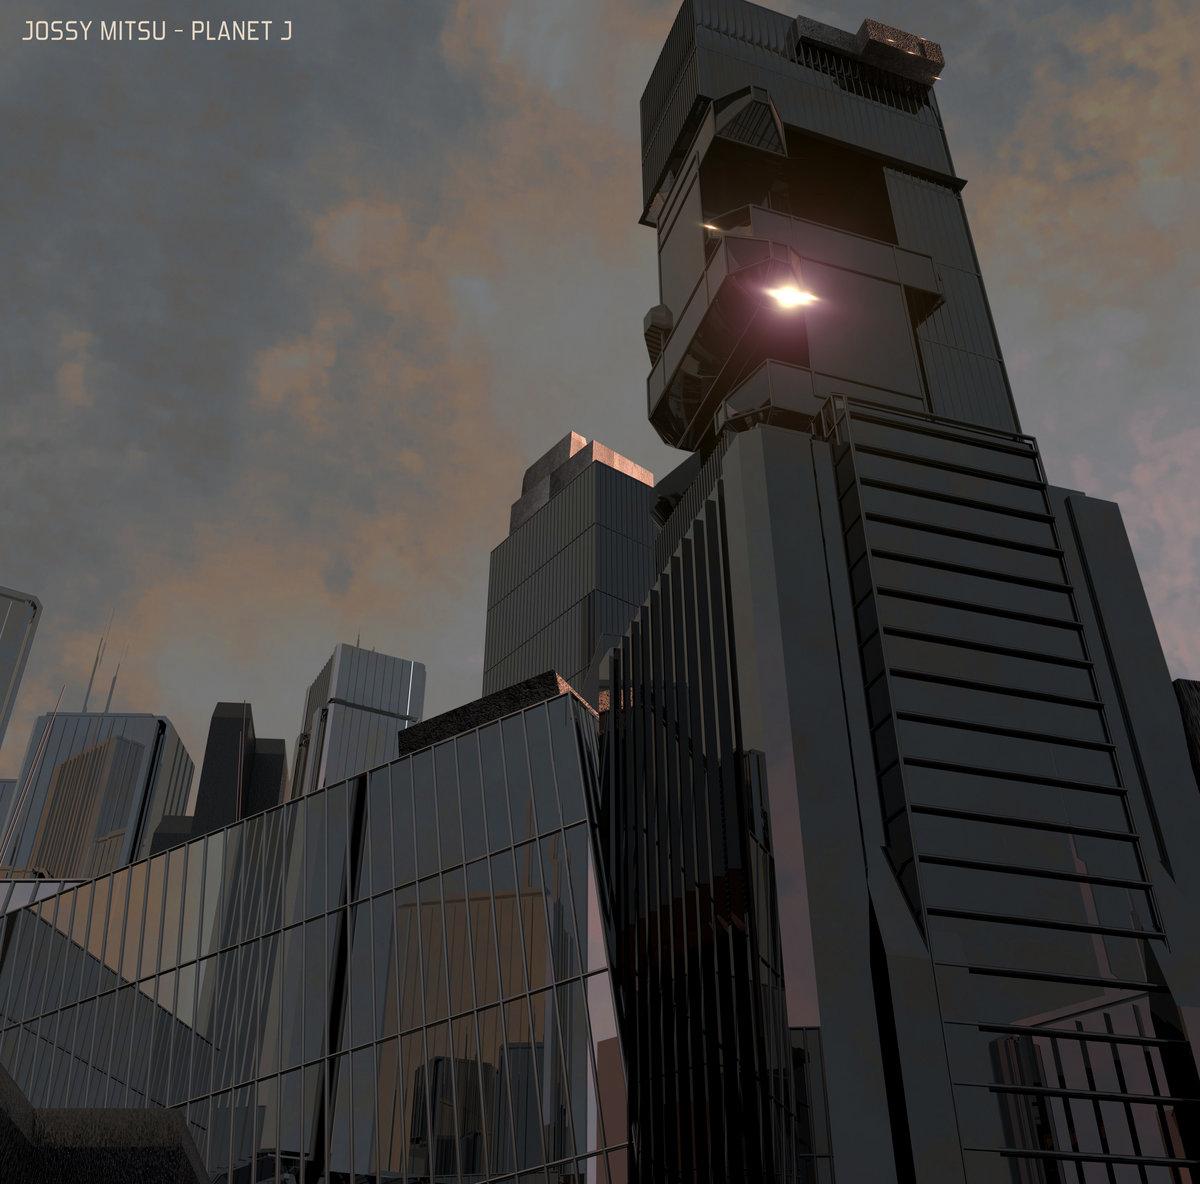 Planet J EP - Jossy Mitsu